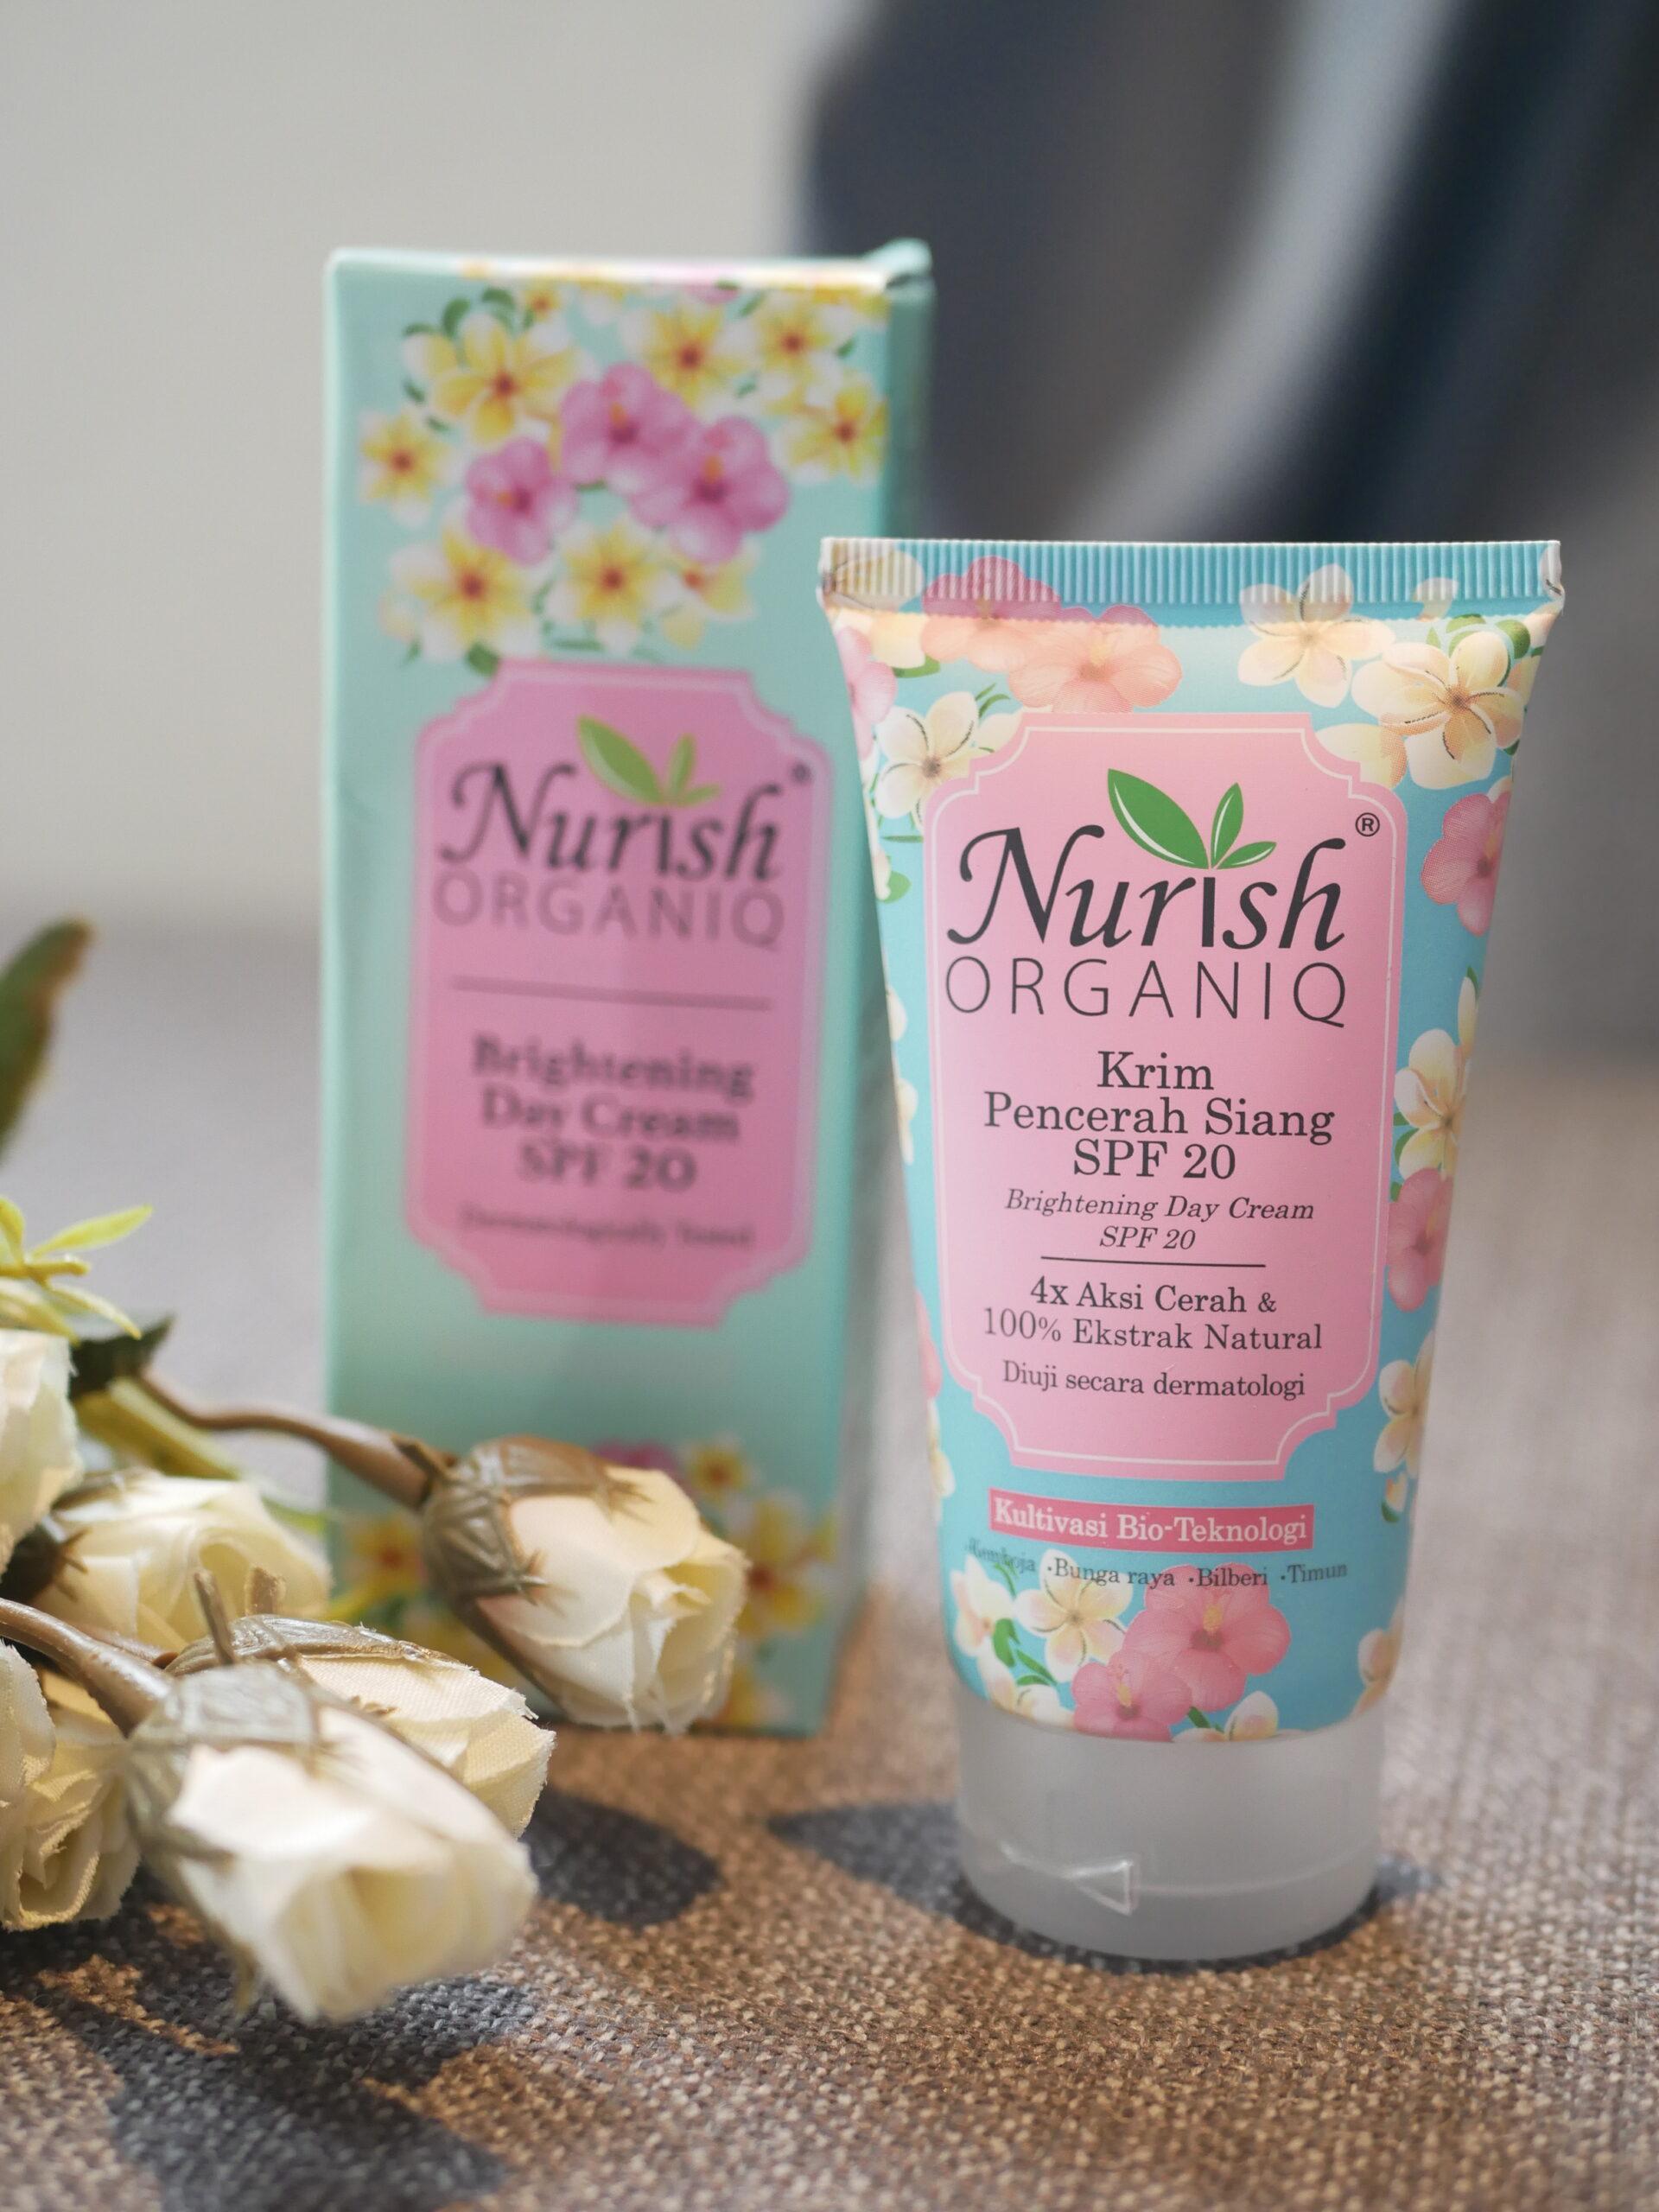 Nurish Organiq Brigthening Day Cream